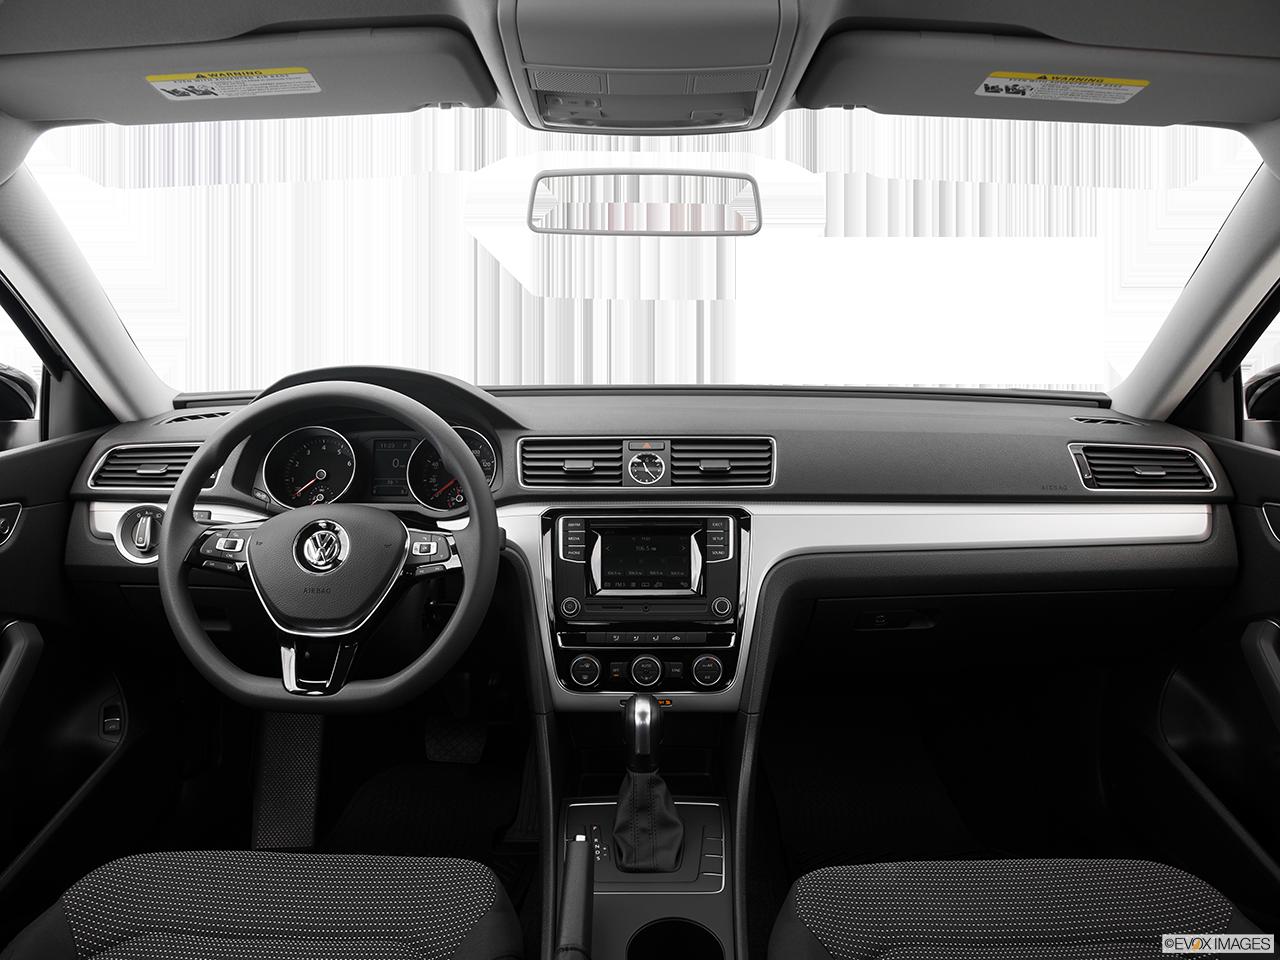 2016 Volkswagen Passat dealer serving Nashville | Hallmark Volkswagen at Cool Springs